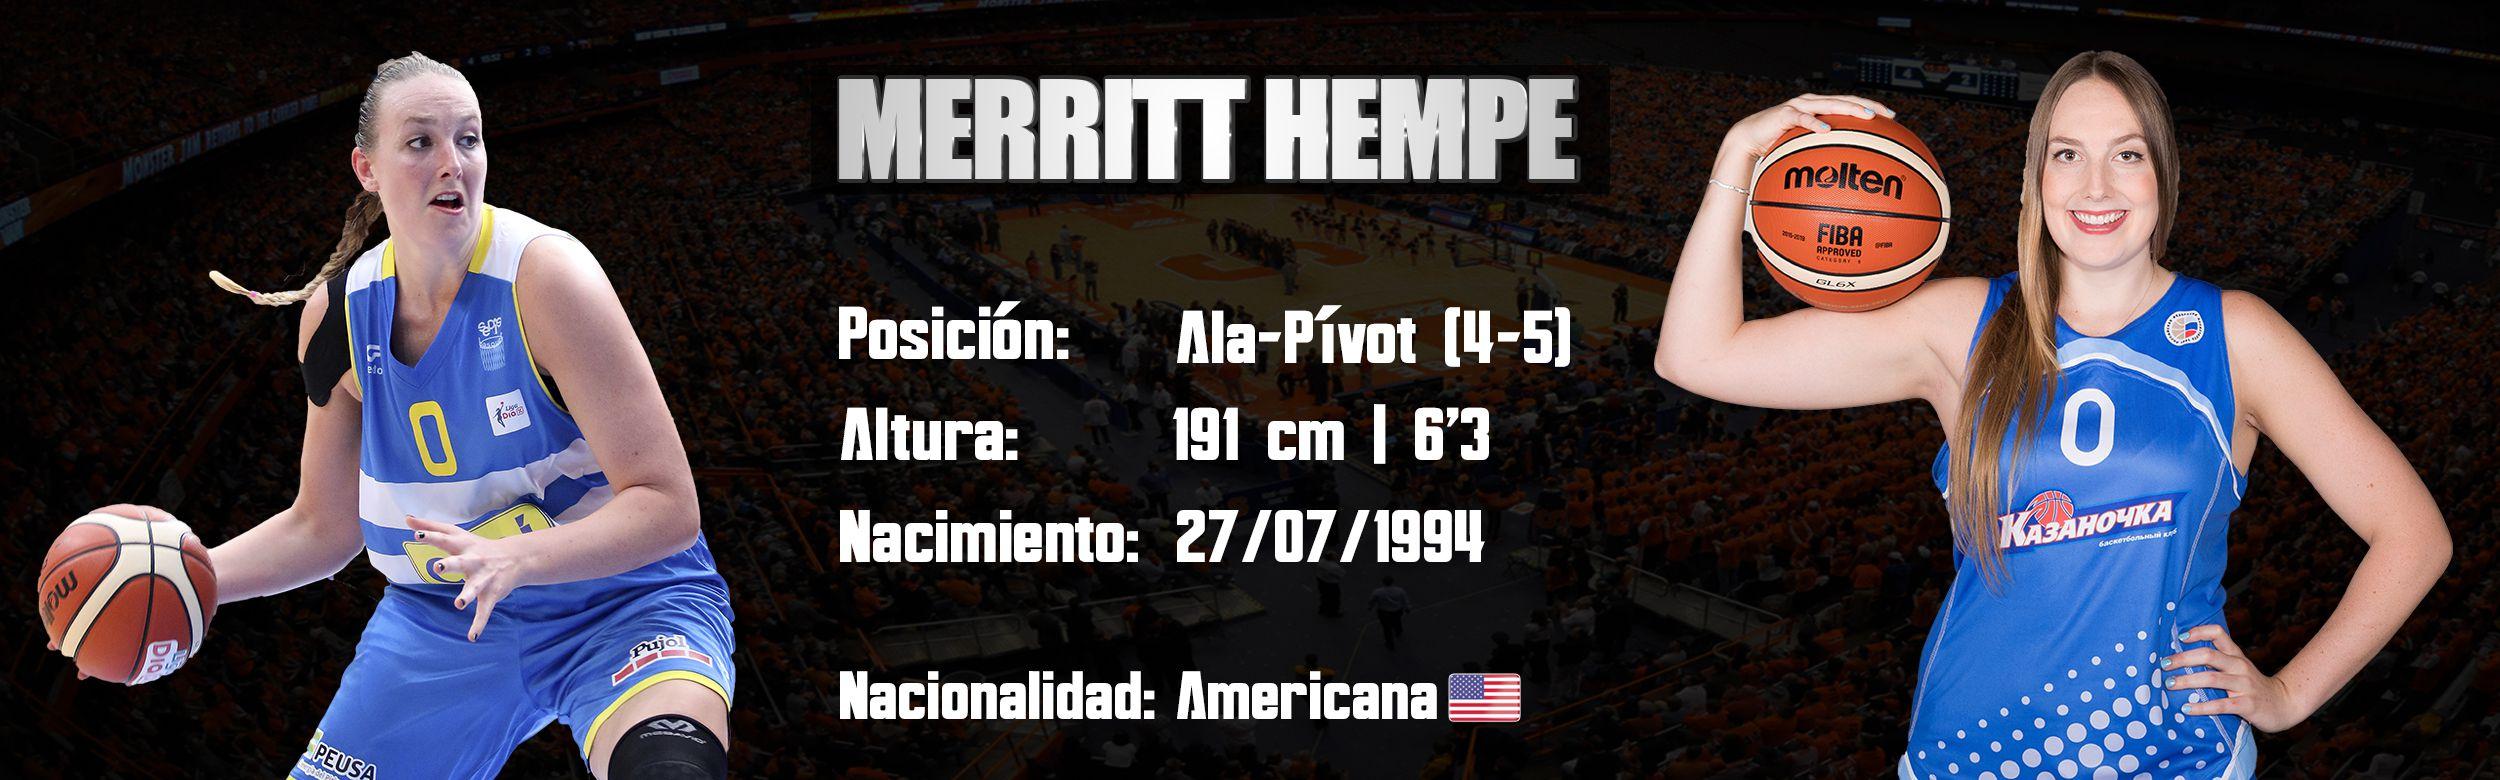 Merritt Hempe